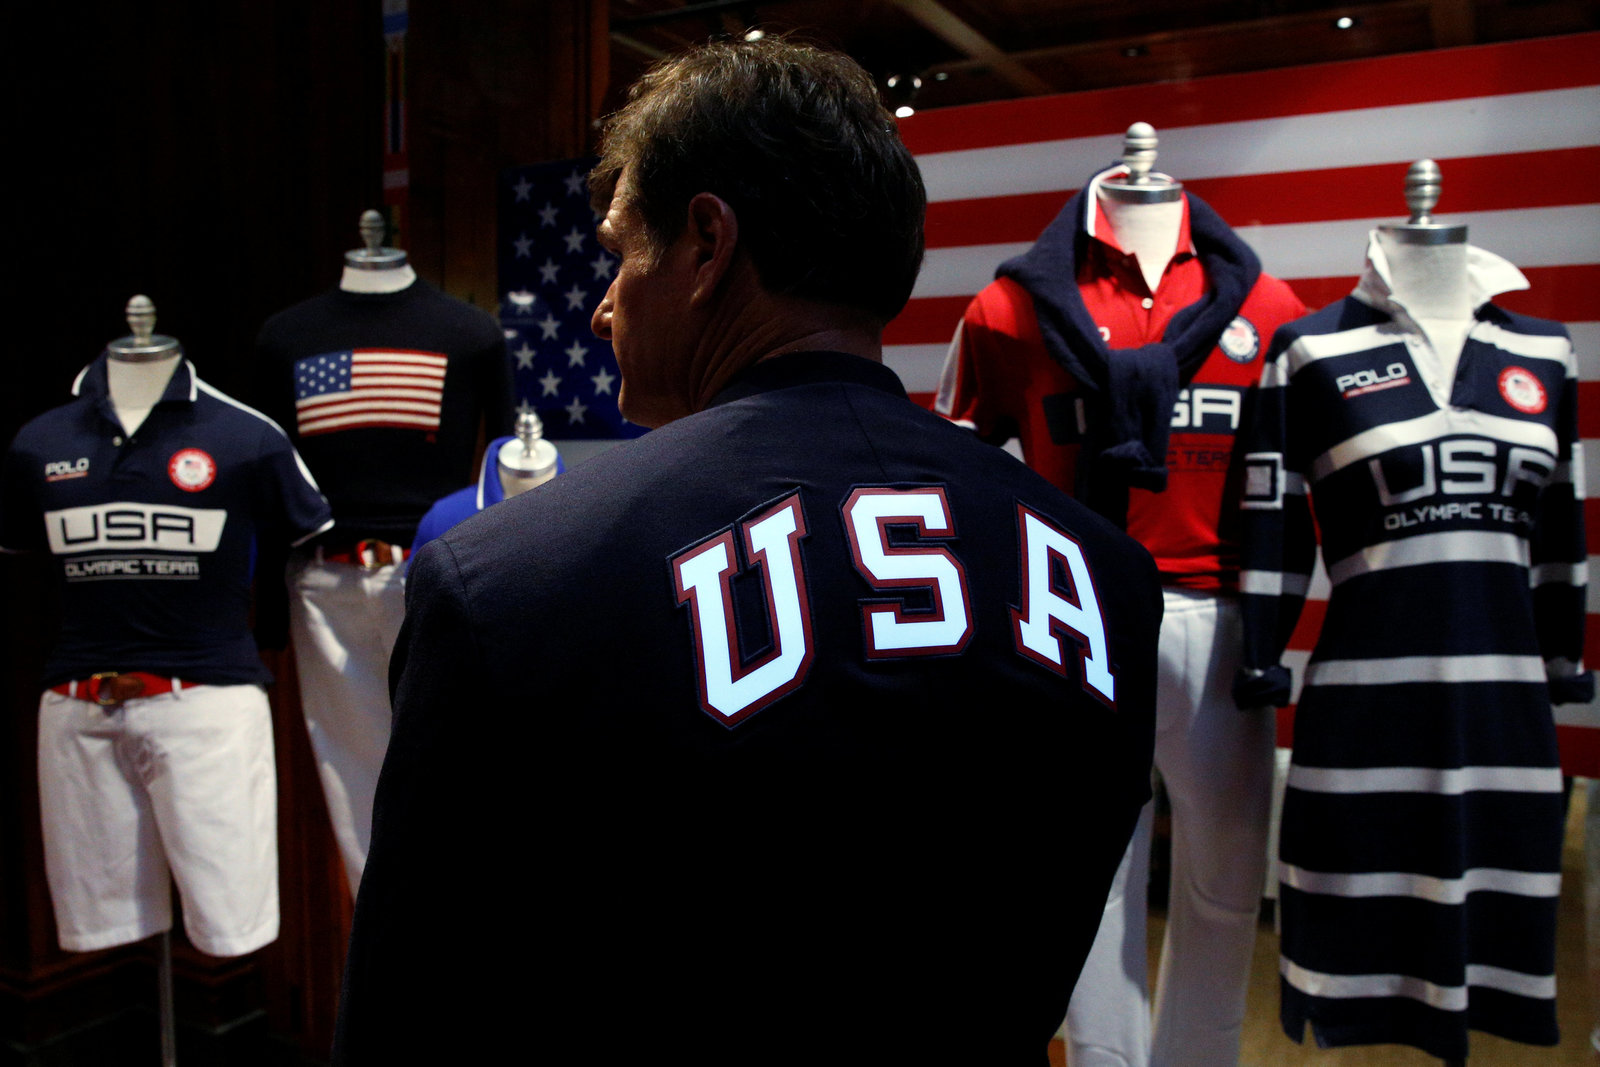 Polo Ralph Lauren 是里約奧運美國代表隊的官方服裝品牌。圖片來源:路透社